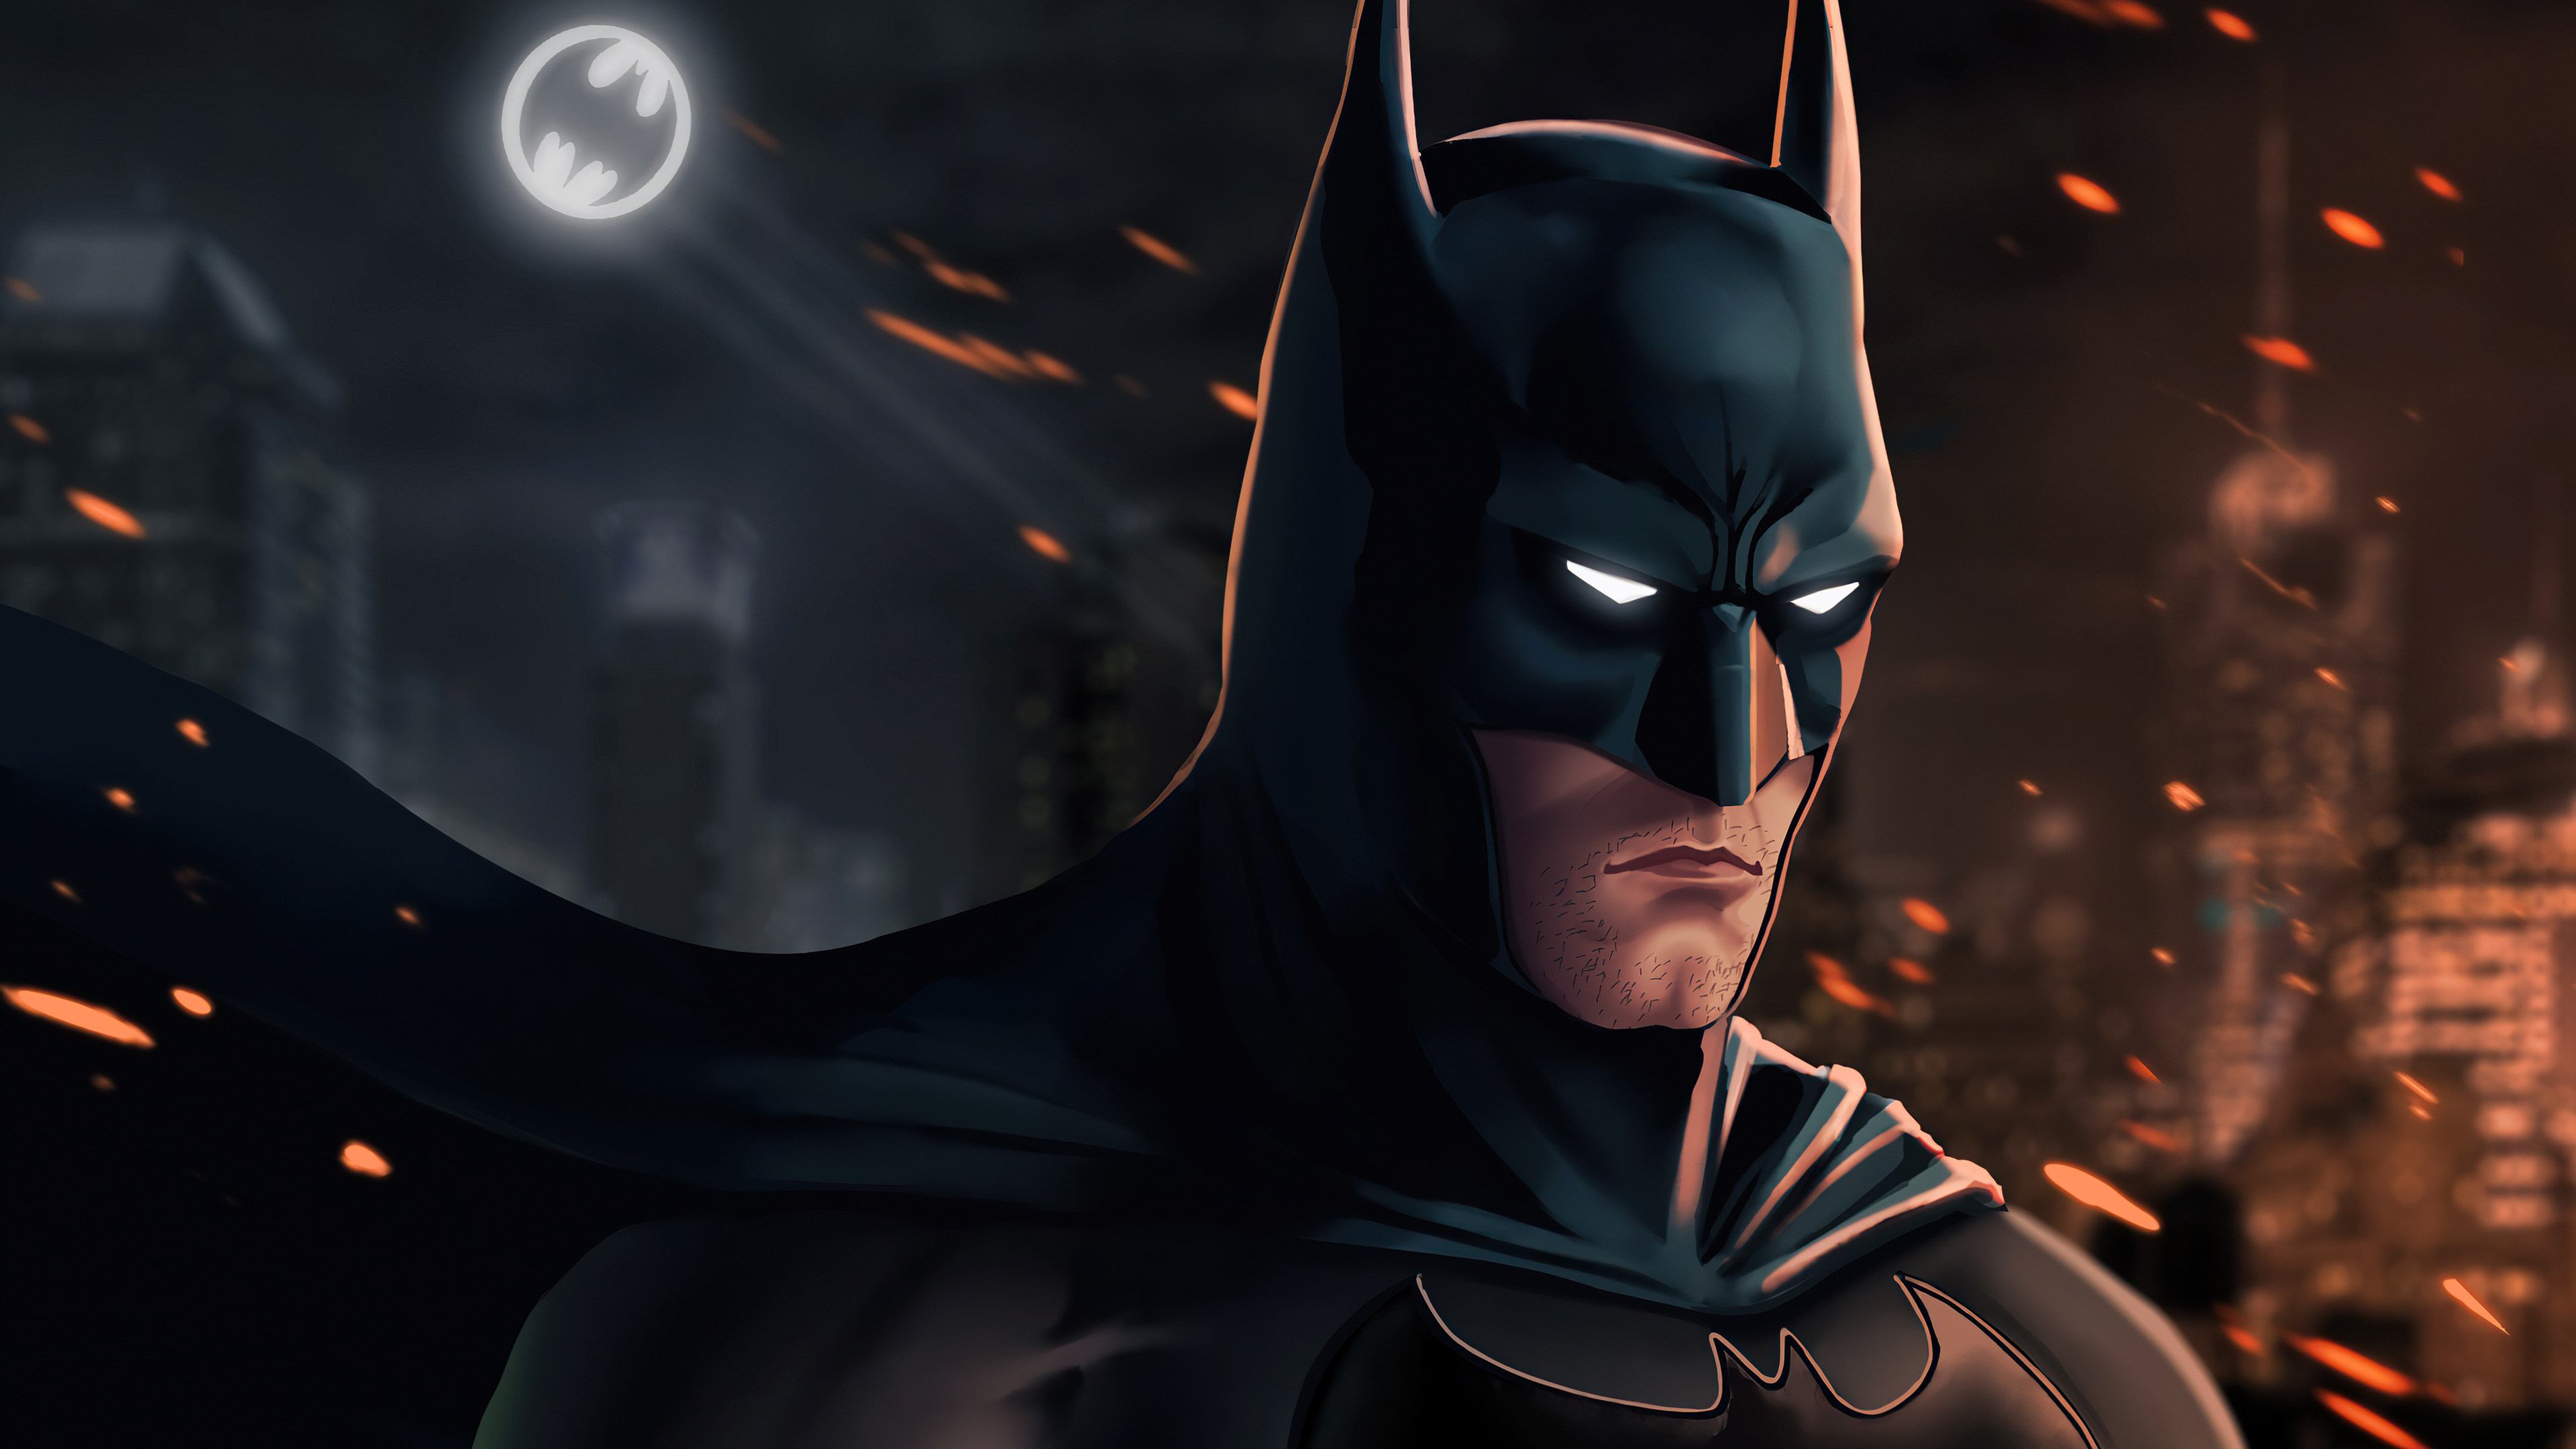 batman 2020 new artwork 4k 1604348255 - Batman 2020 New Artwork 4k - Batman 2020 New Artwork 4k wallpapers